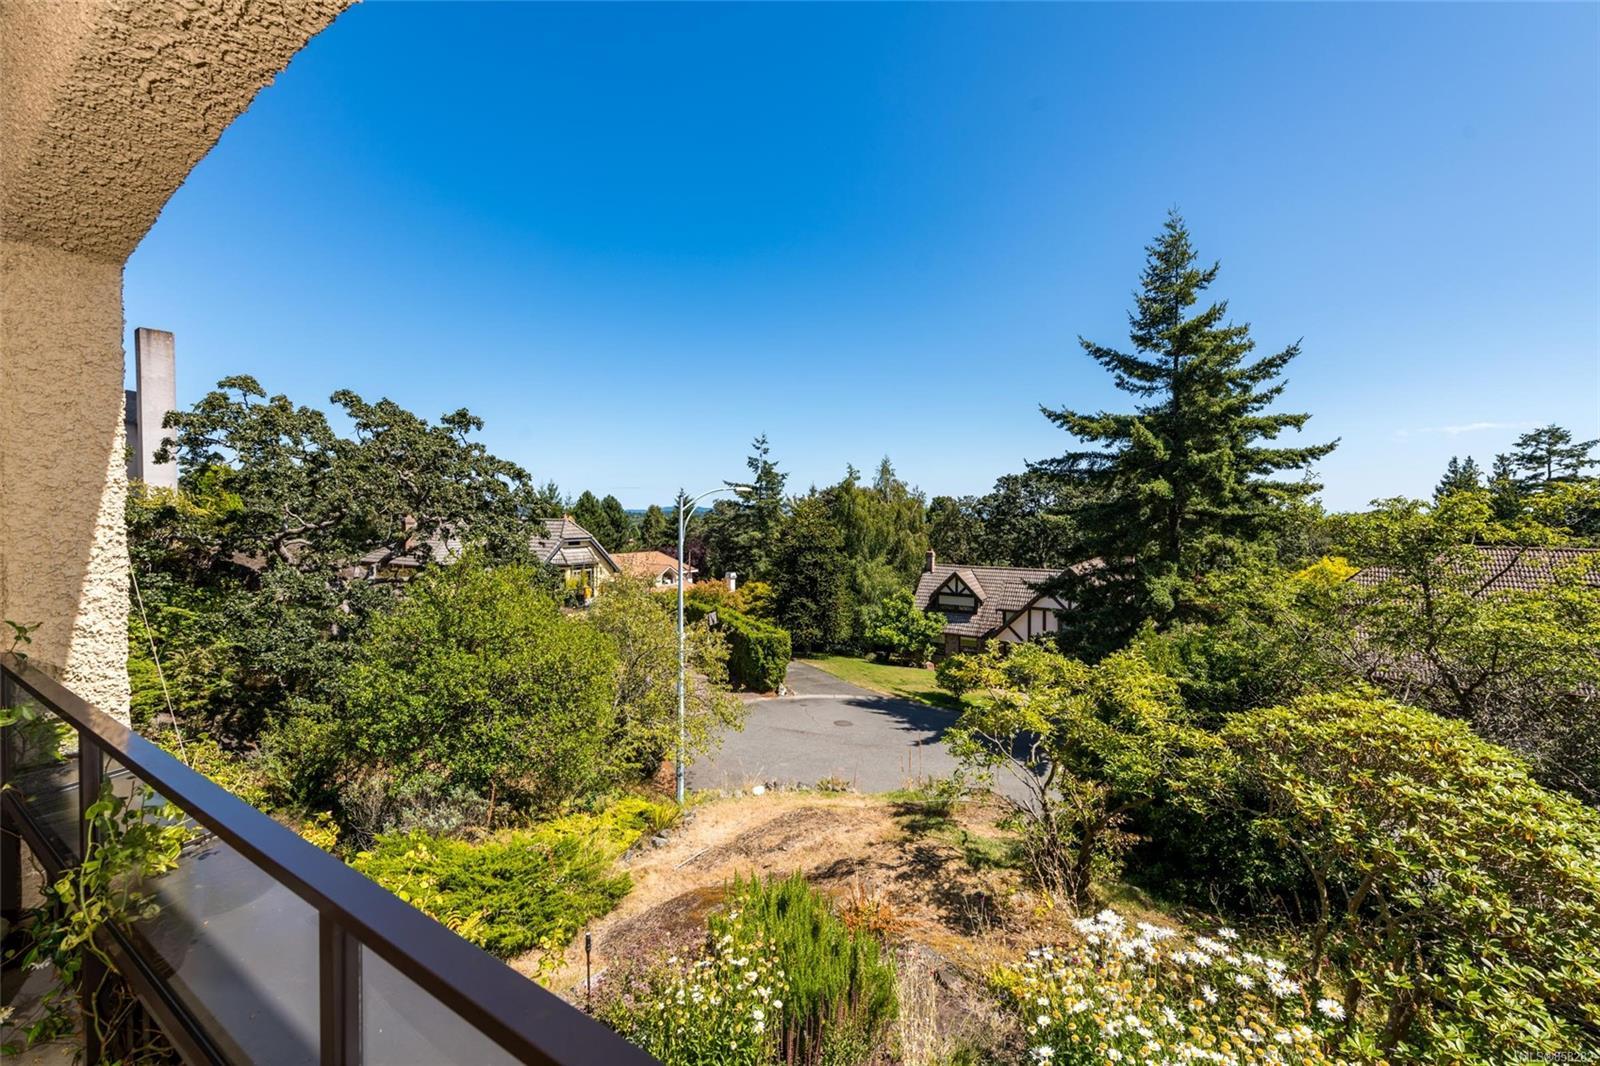 Photo 24 at 2 - 1001 Terrace Avenue, Rockland, Victoria